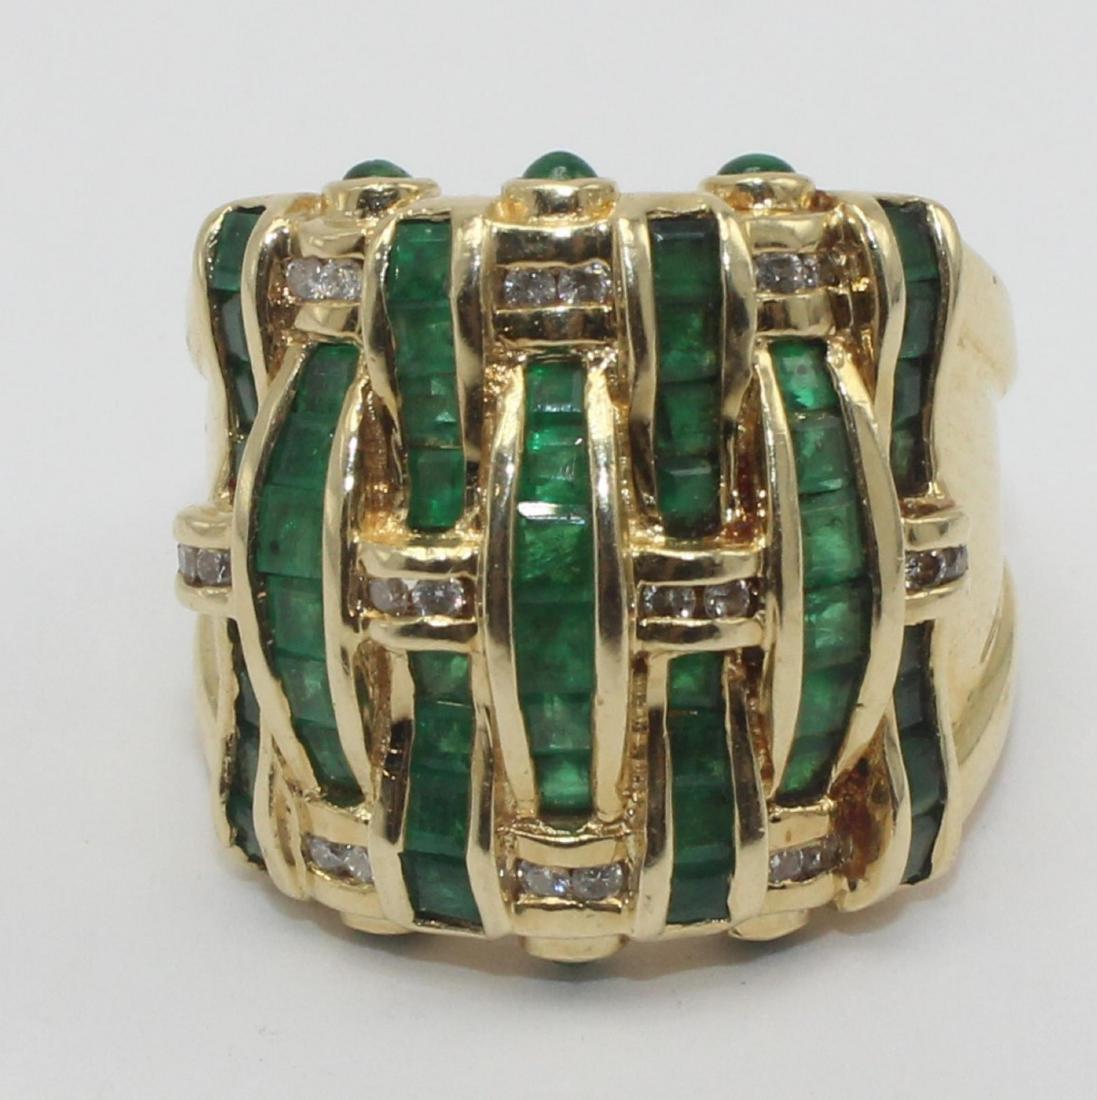 14k YG Italian Approx 2 ct Emerald & 0.25 ct diamond